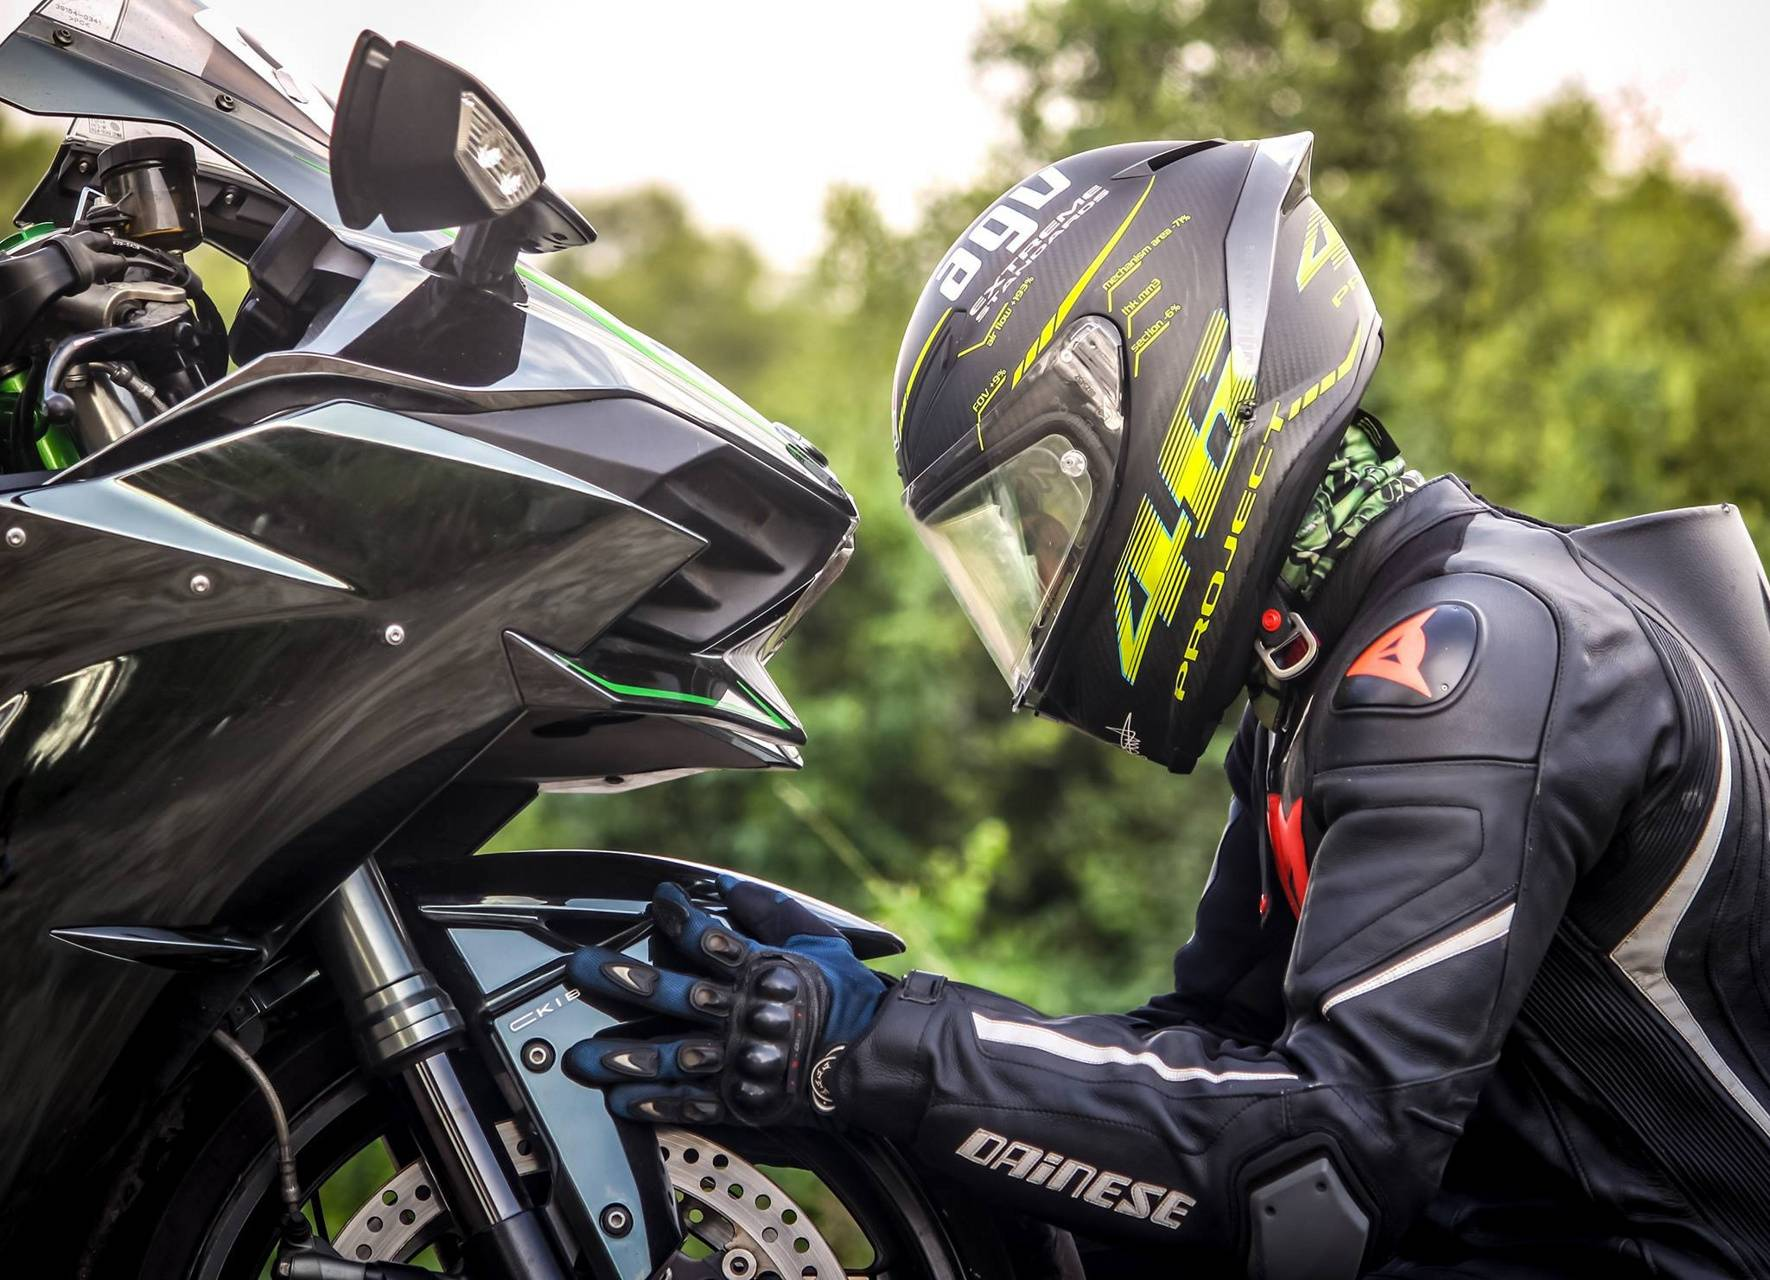 Bike with Rider